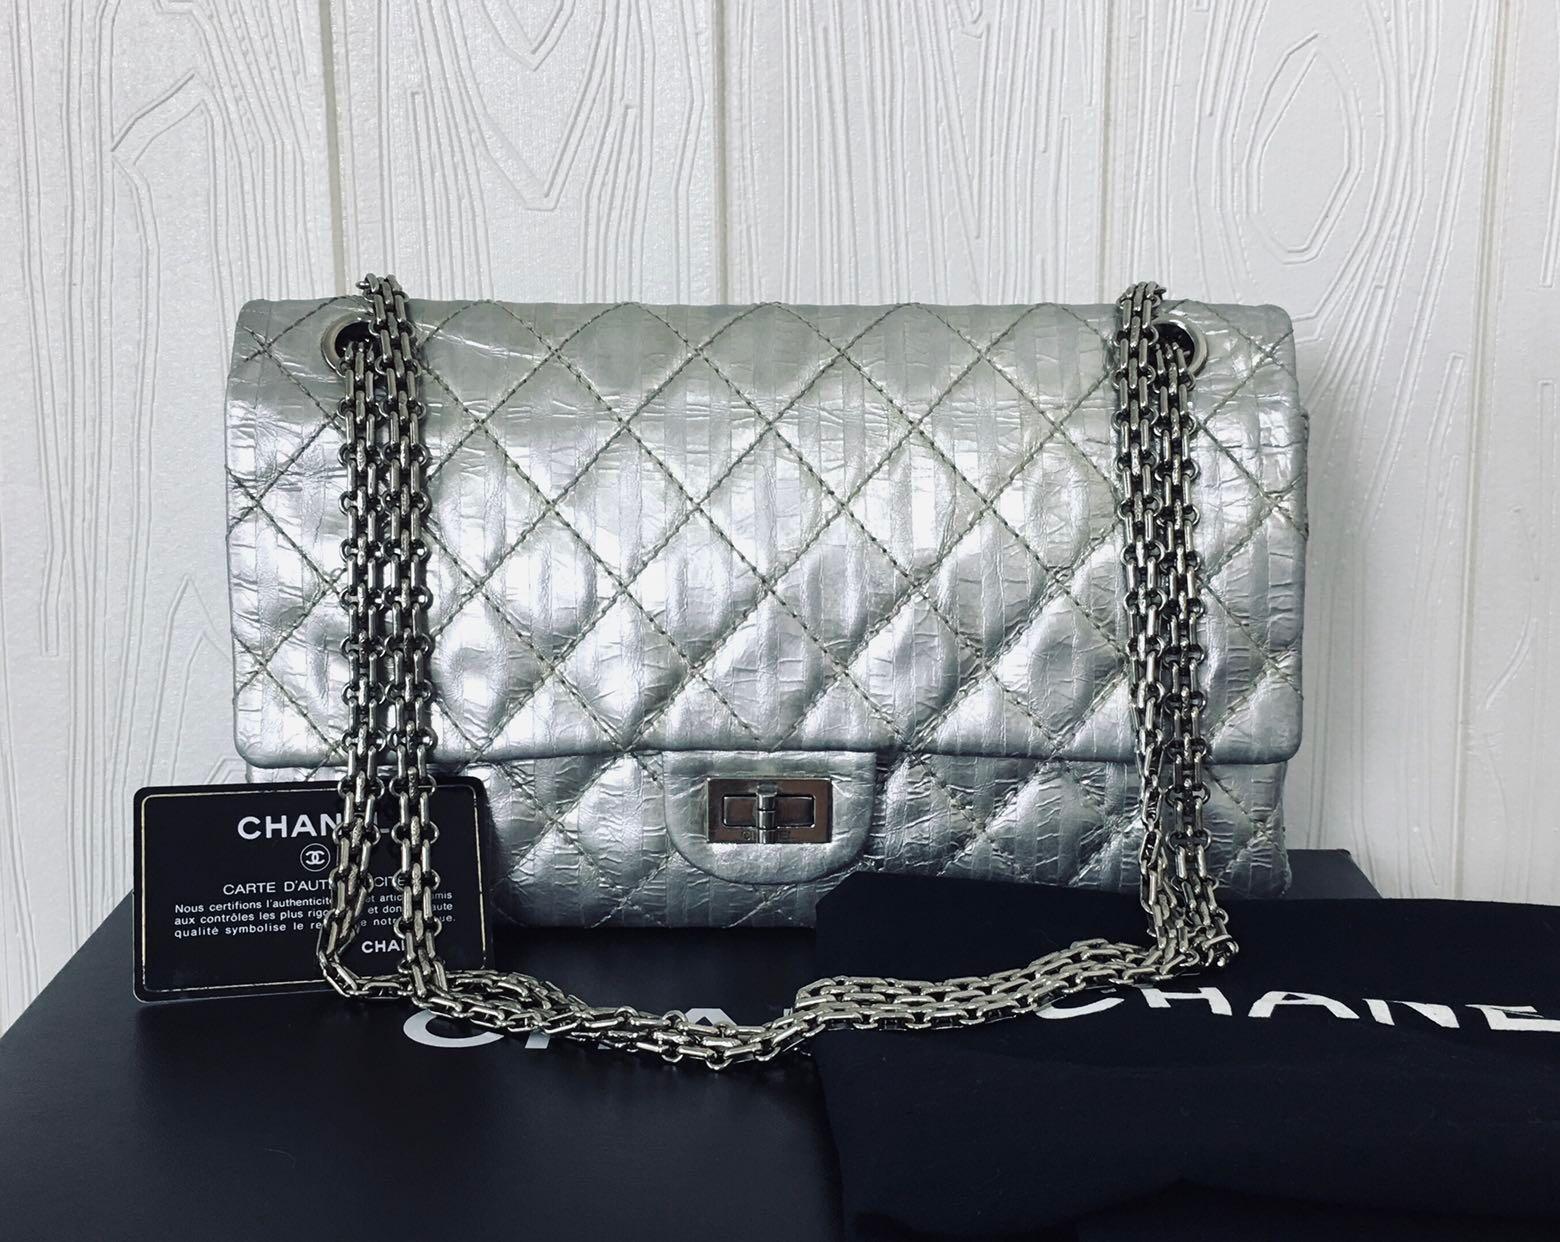 7cb0dcb71cbd Chanel reissue 226 limited edition, Luxury, Bags & Wallets, Handbags ...